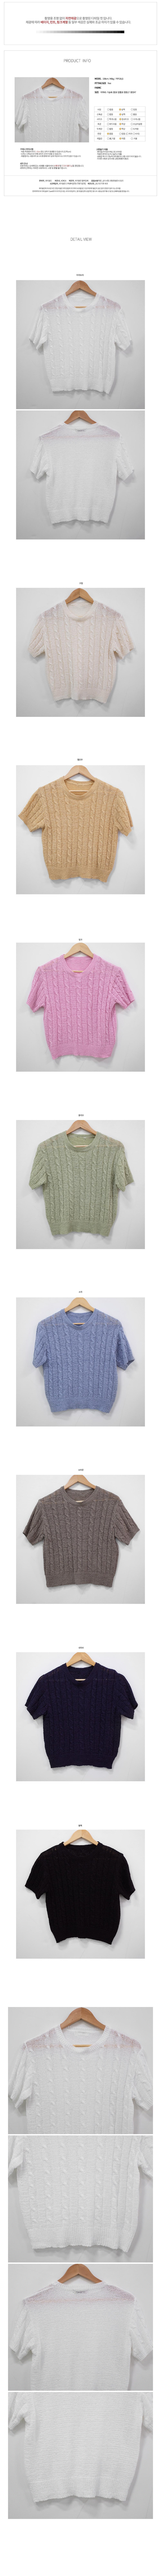 Tiru Twisted Short Sleeve Knitwear